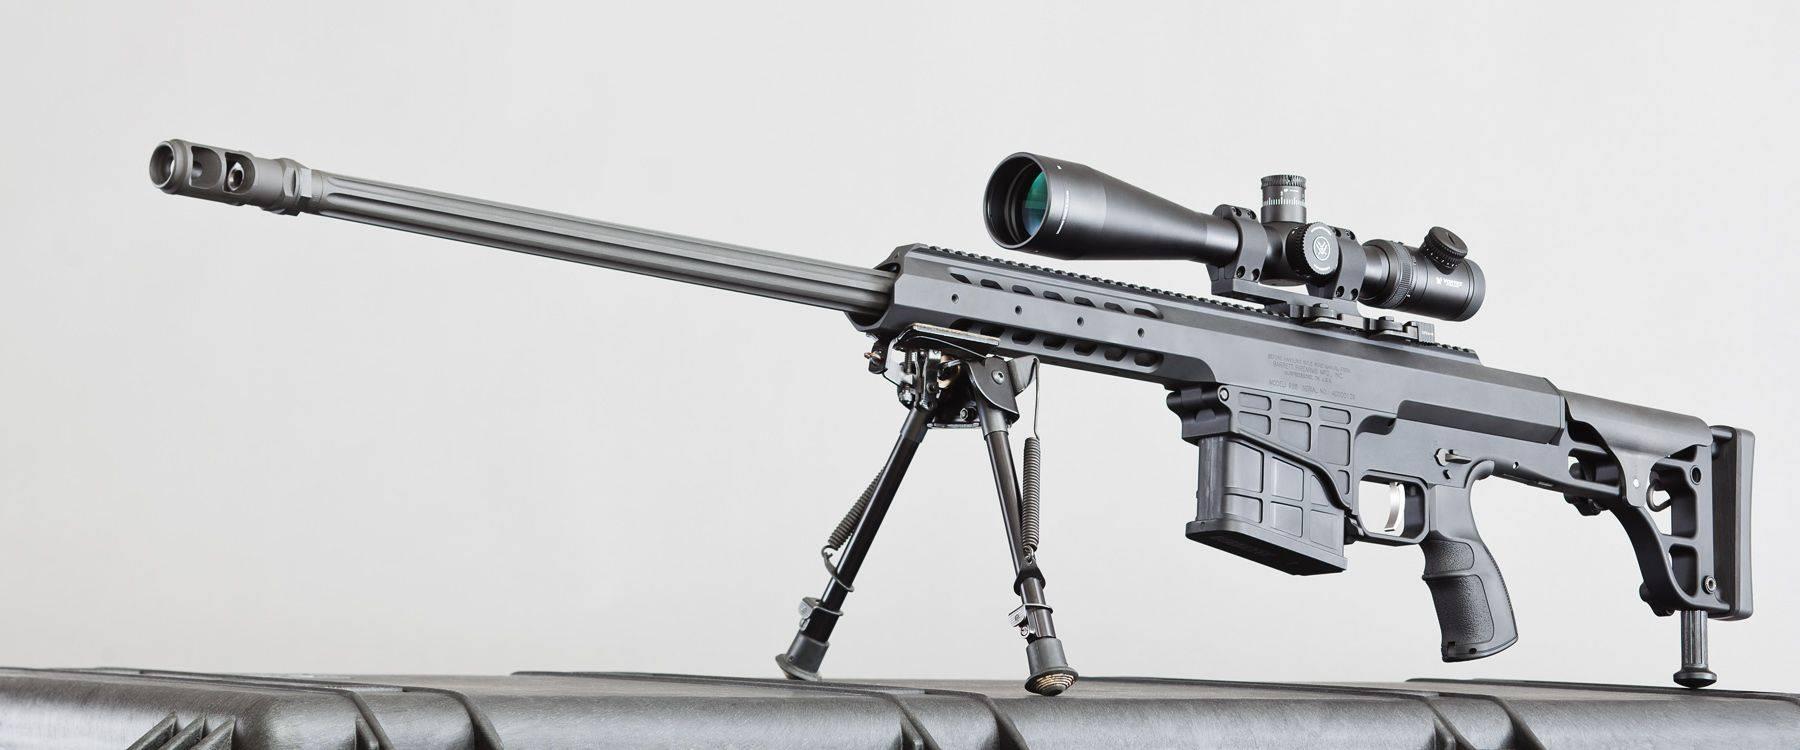 Снайперская винтовка barrett 98b